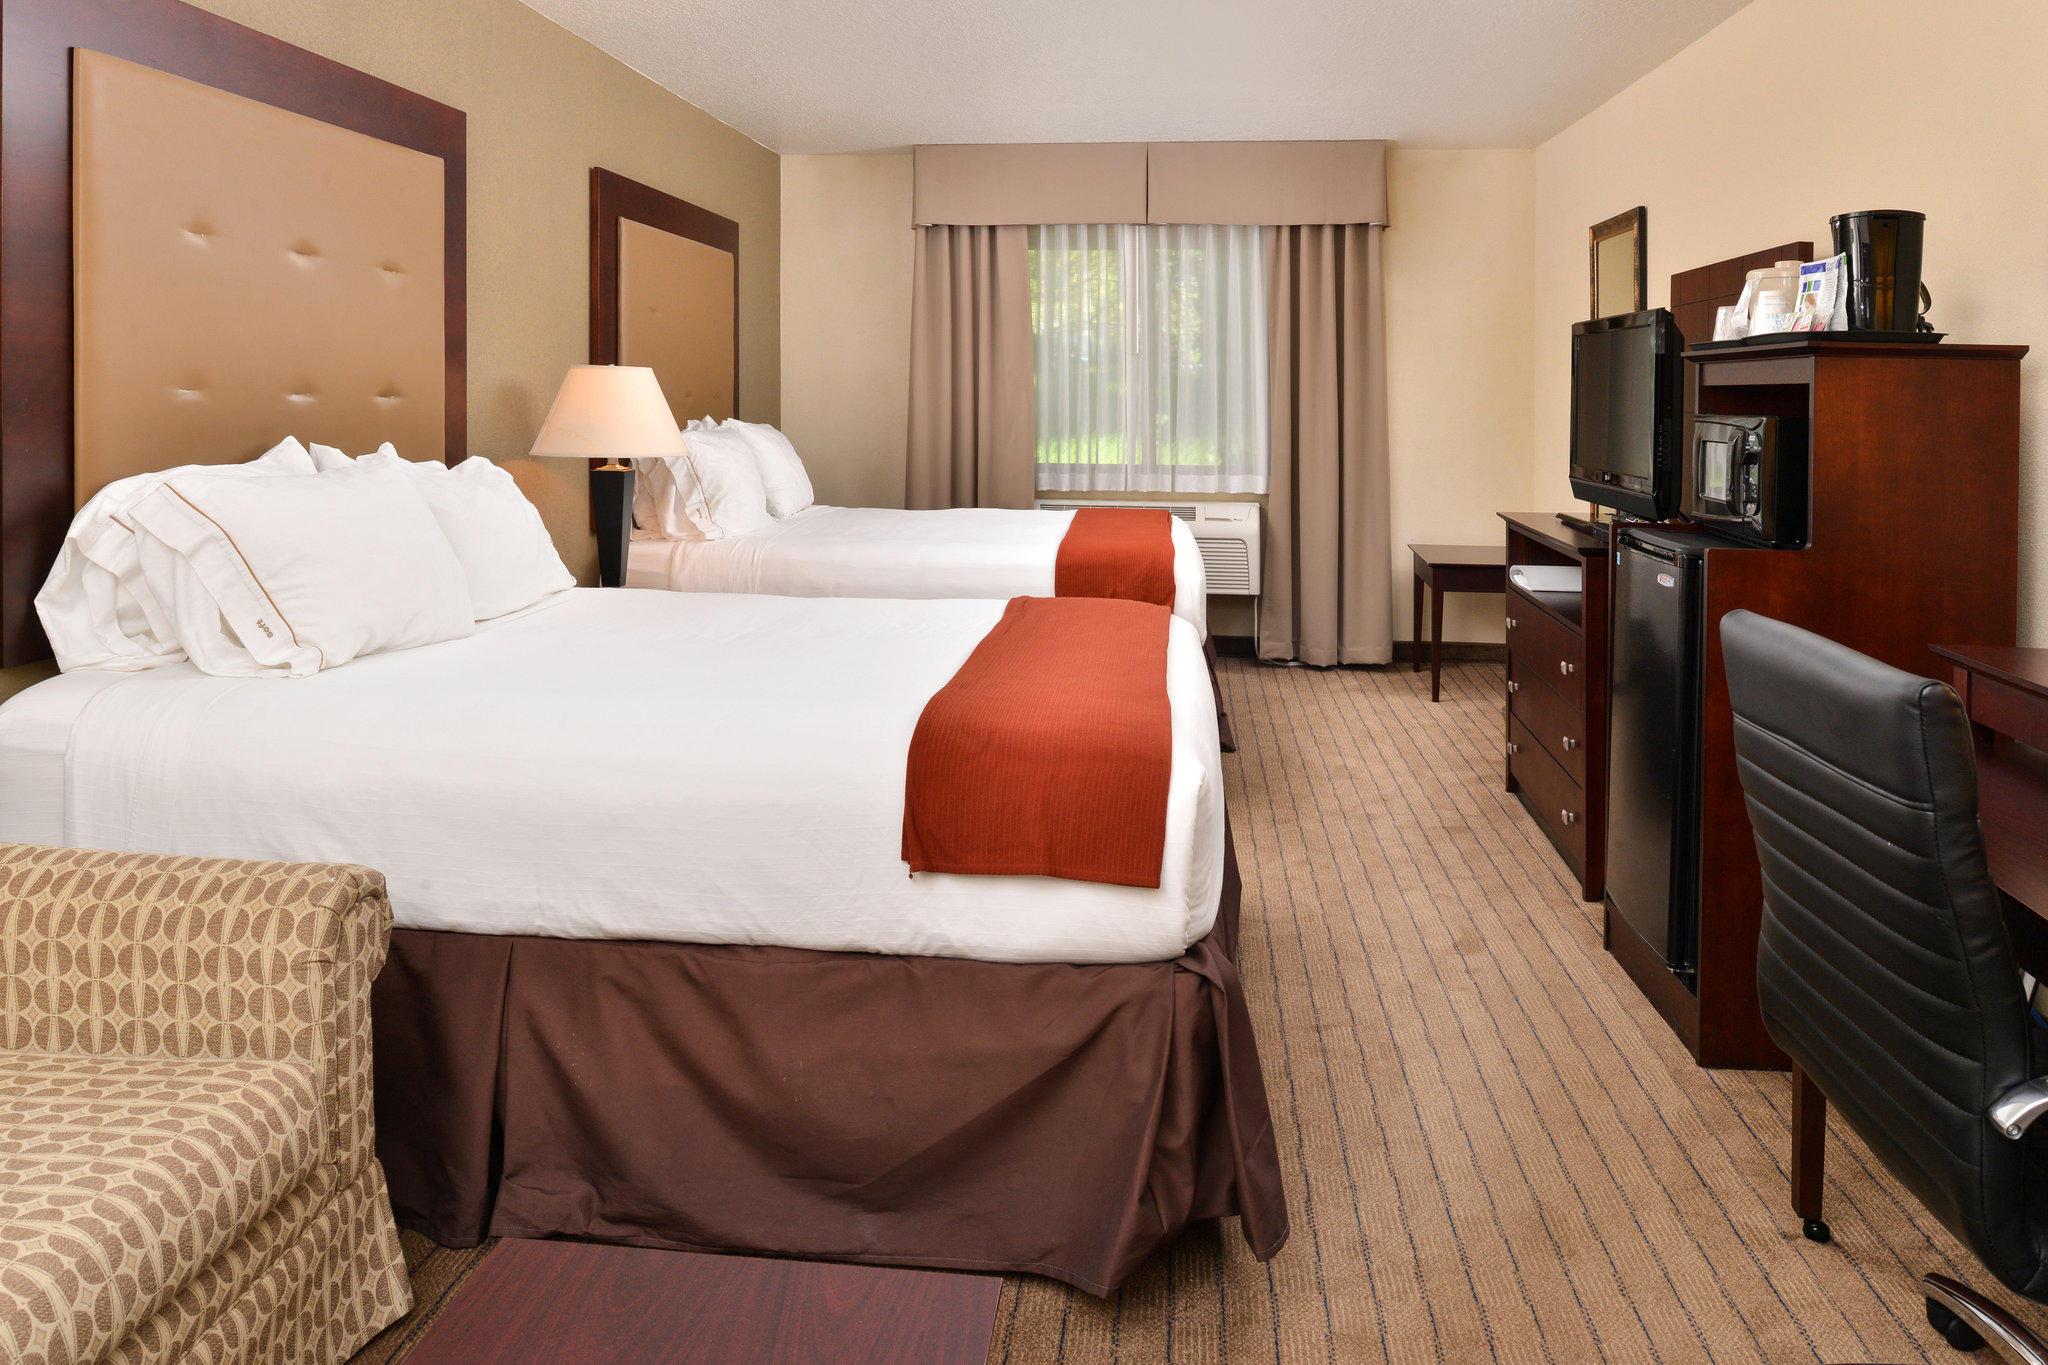 Holiday Inn Express Portland South - Lake Oswego